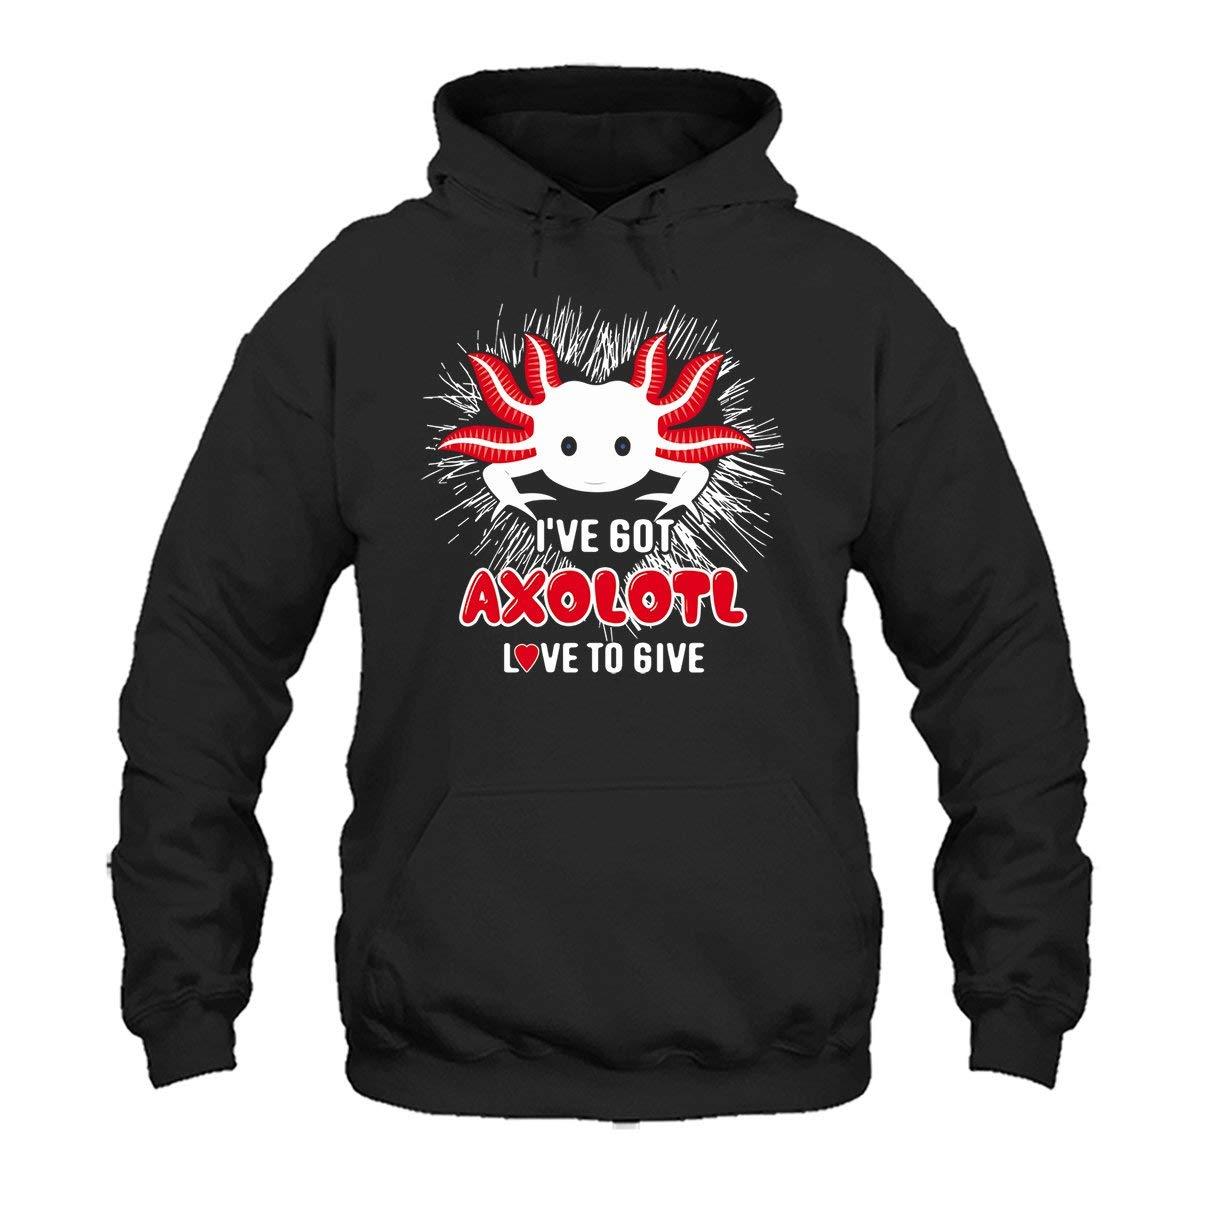 Hoodie Ive Got Axolotl Love to Give Tee Shirt Sweatshirt